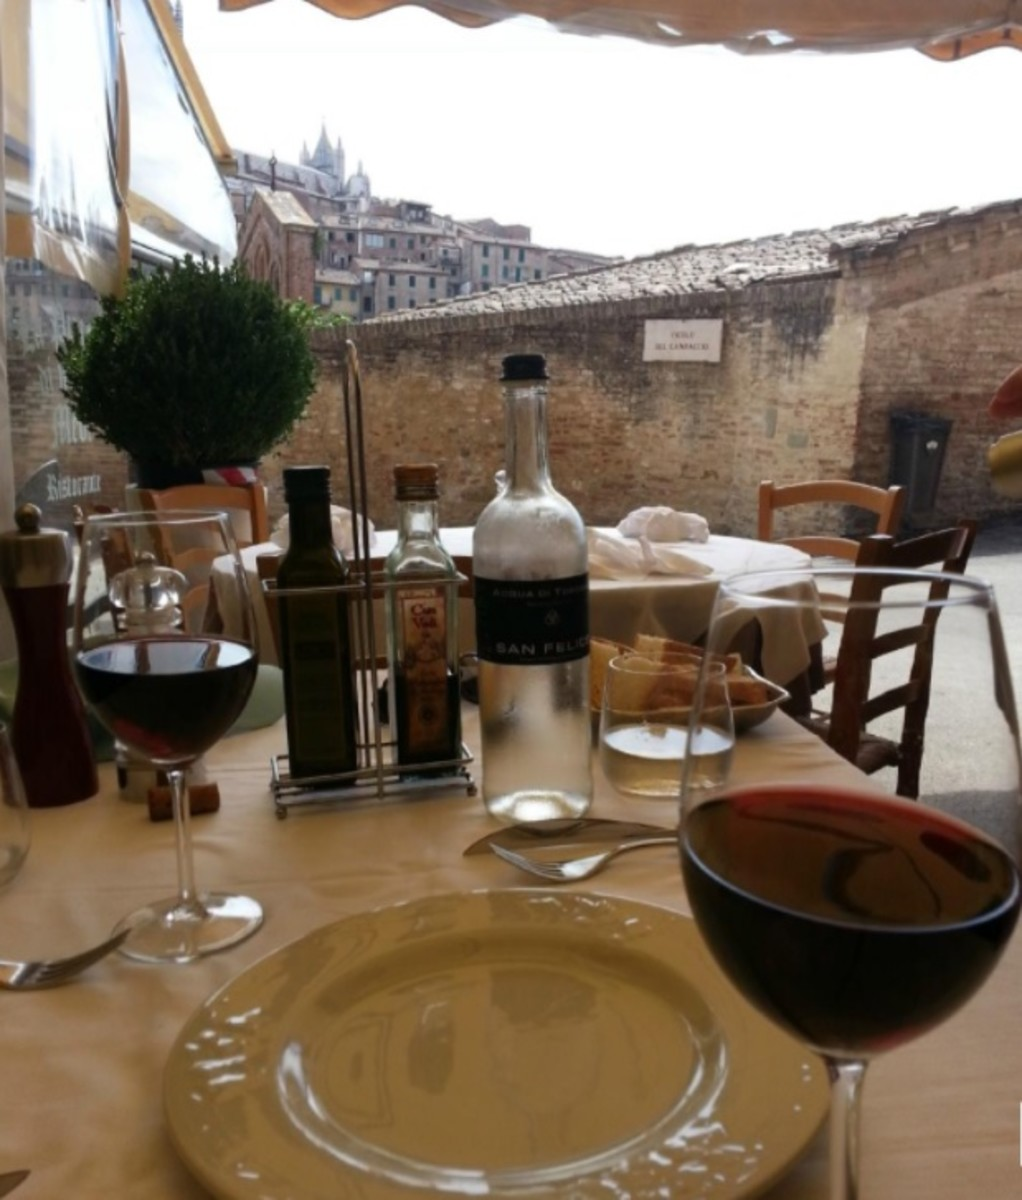 Table for two at Ristorante San Domenico, Siena, Italy